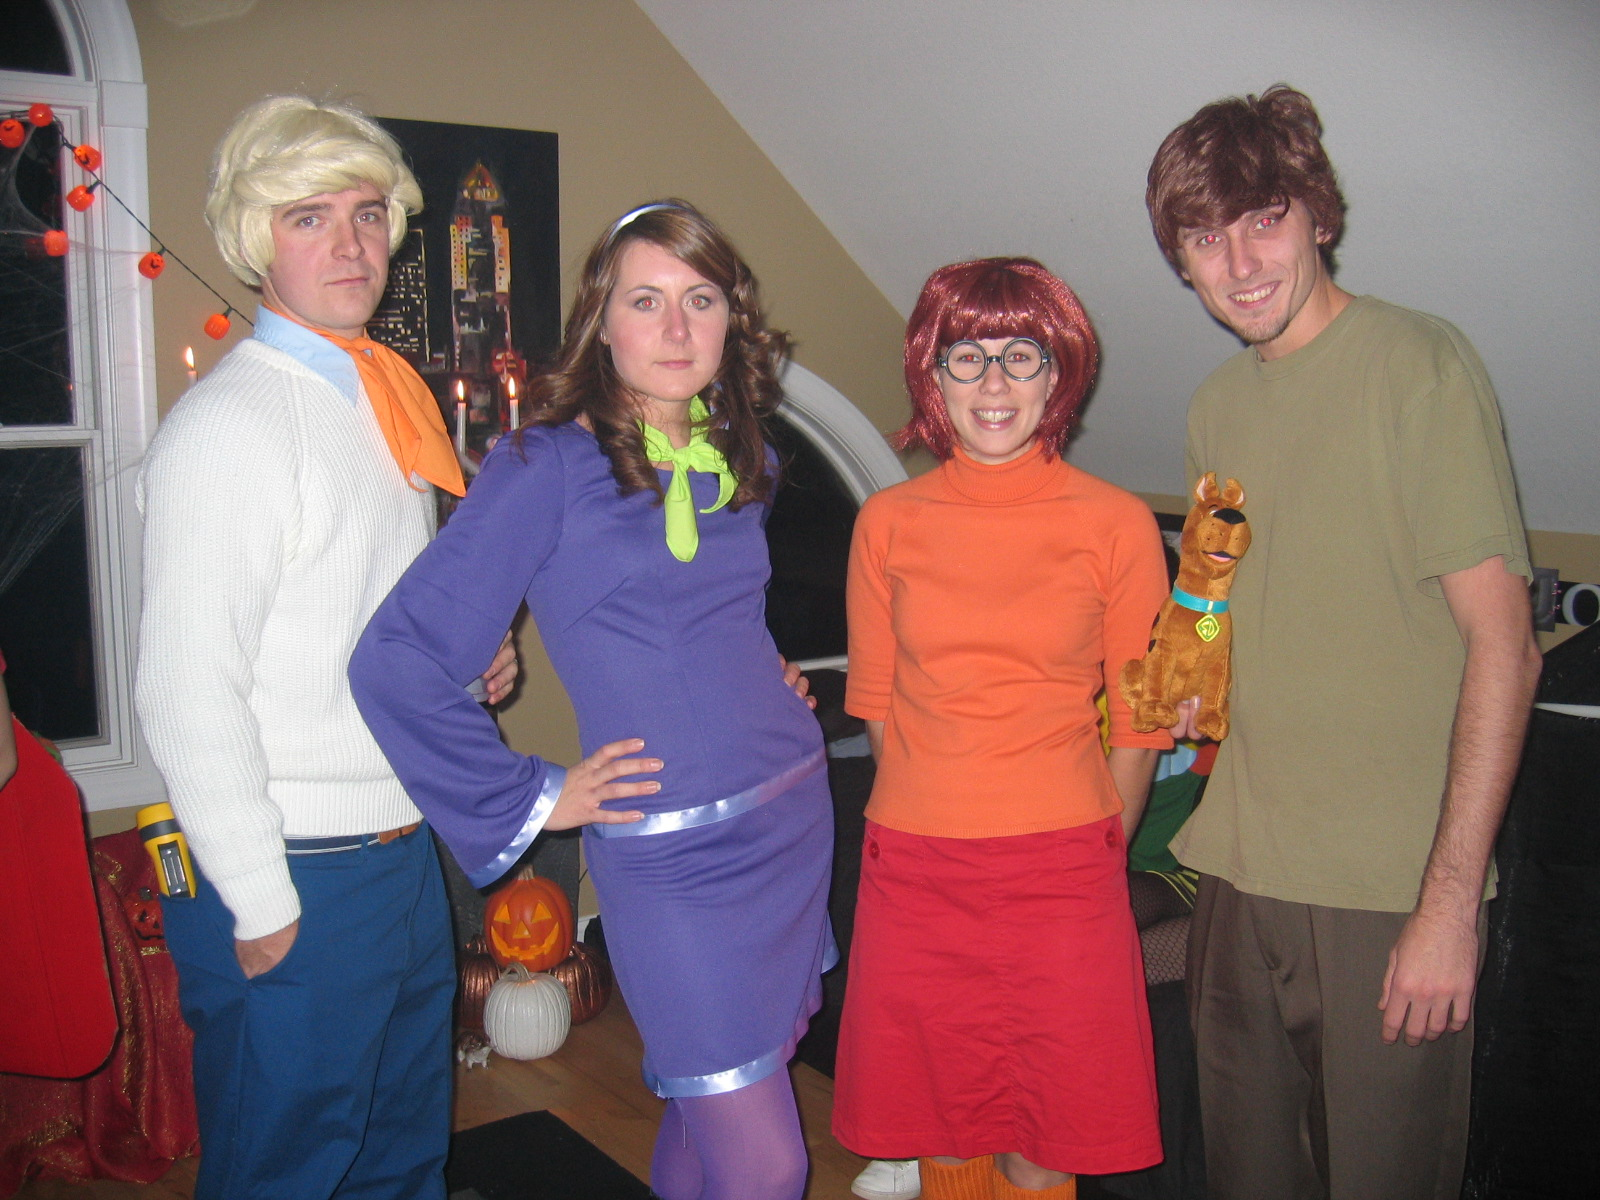 Scooby doo scooby doo one direction scooby doo pictures scooby doo